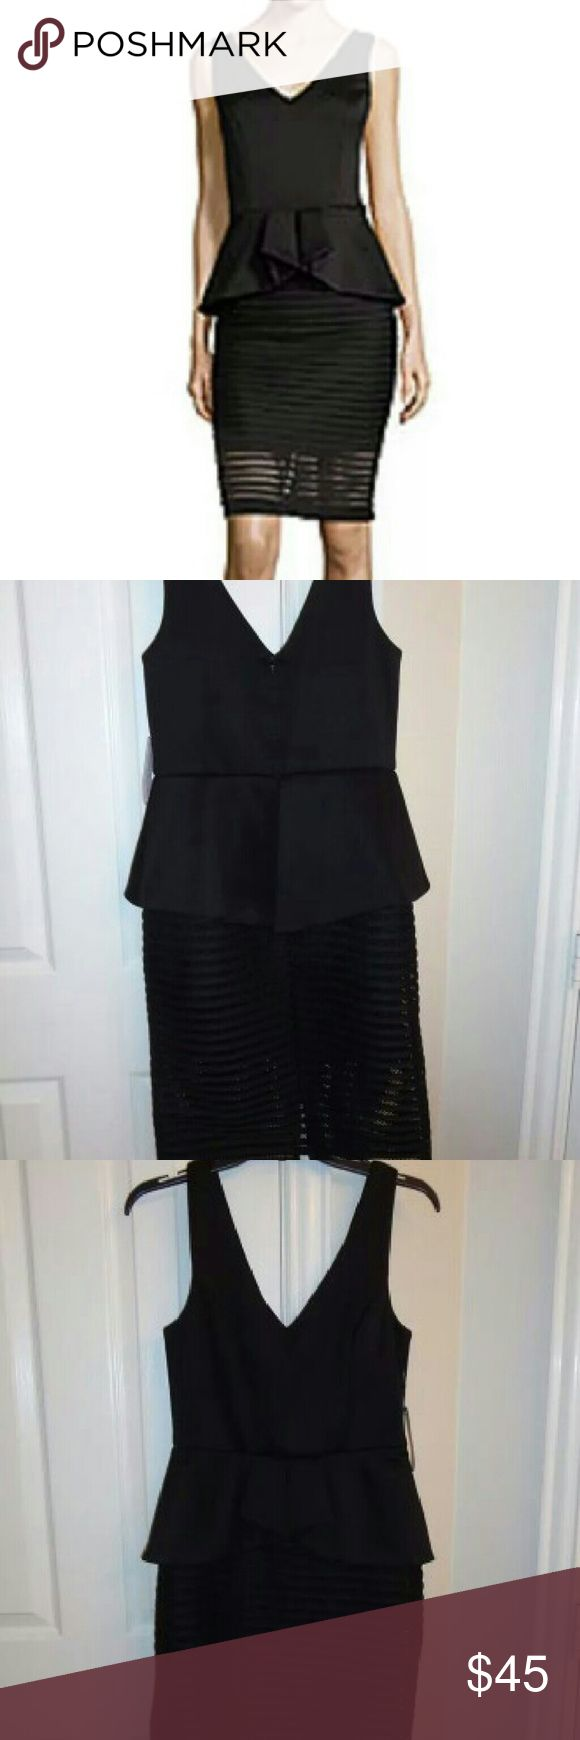 Black dress very - Bisou Bisou Sleveless Peplum Dress Very Beautiful Bisou Bisou Sleeveless Black Peplum Dress In Size 6